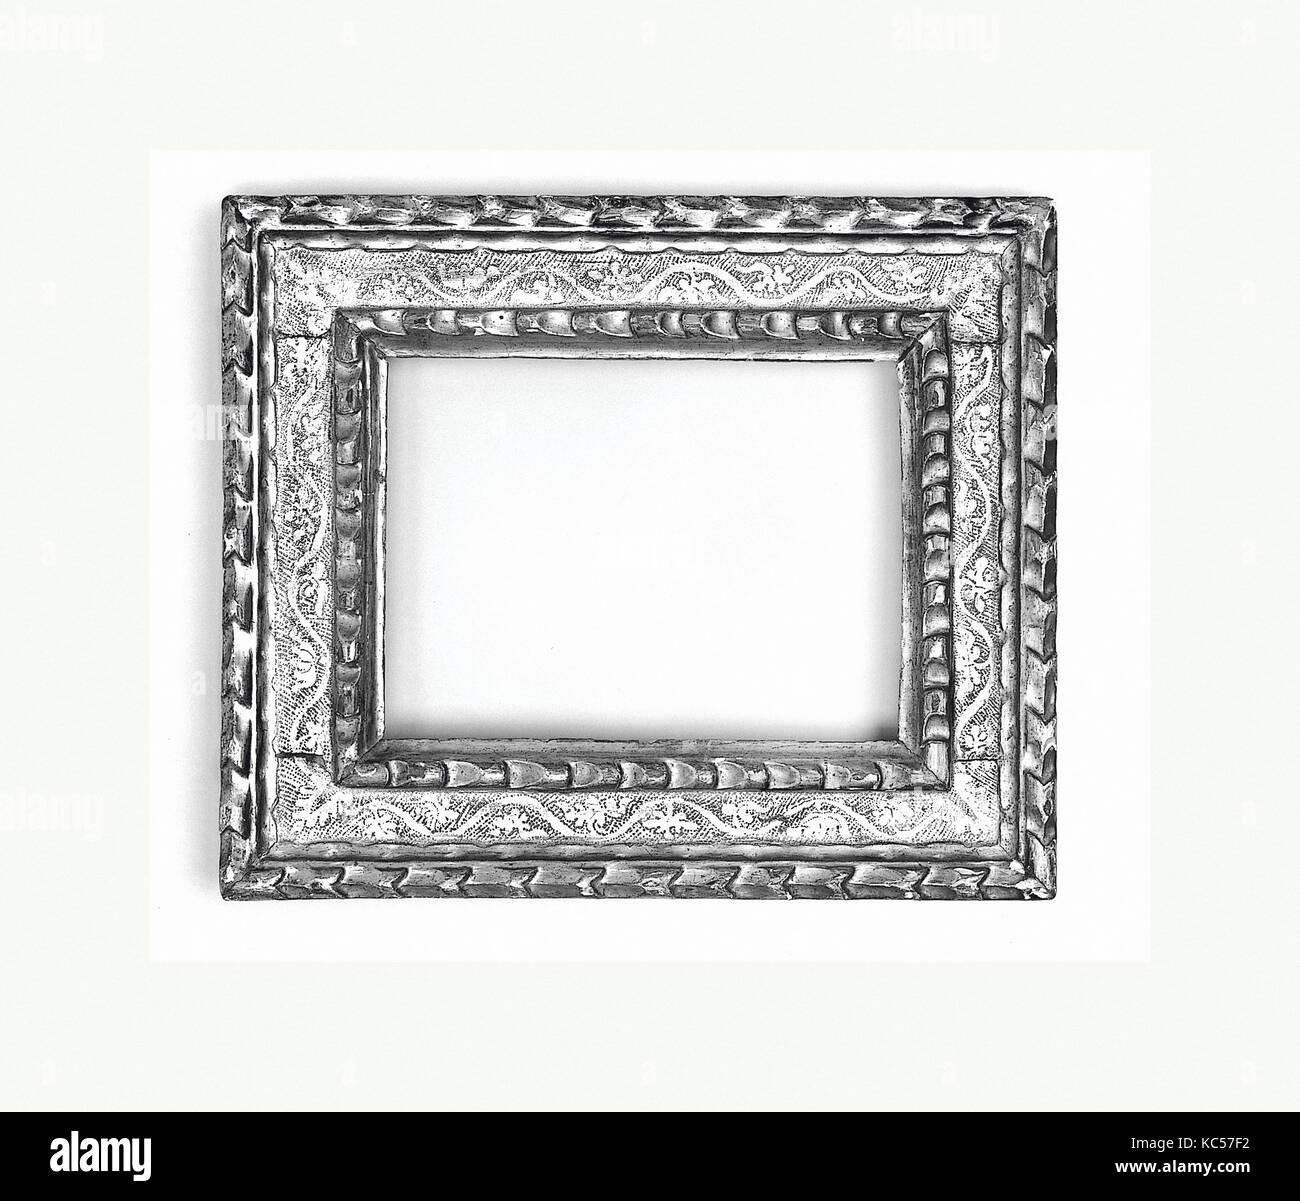 Cassetta frame, mid- to late 16th century, Italian, Bologna, Poplar ...